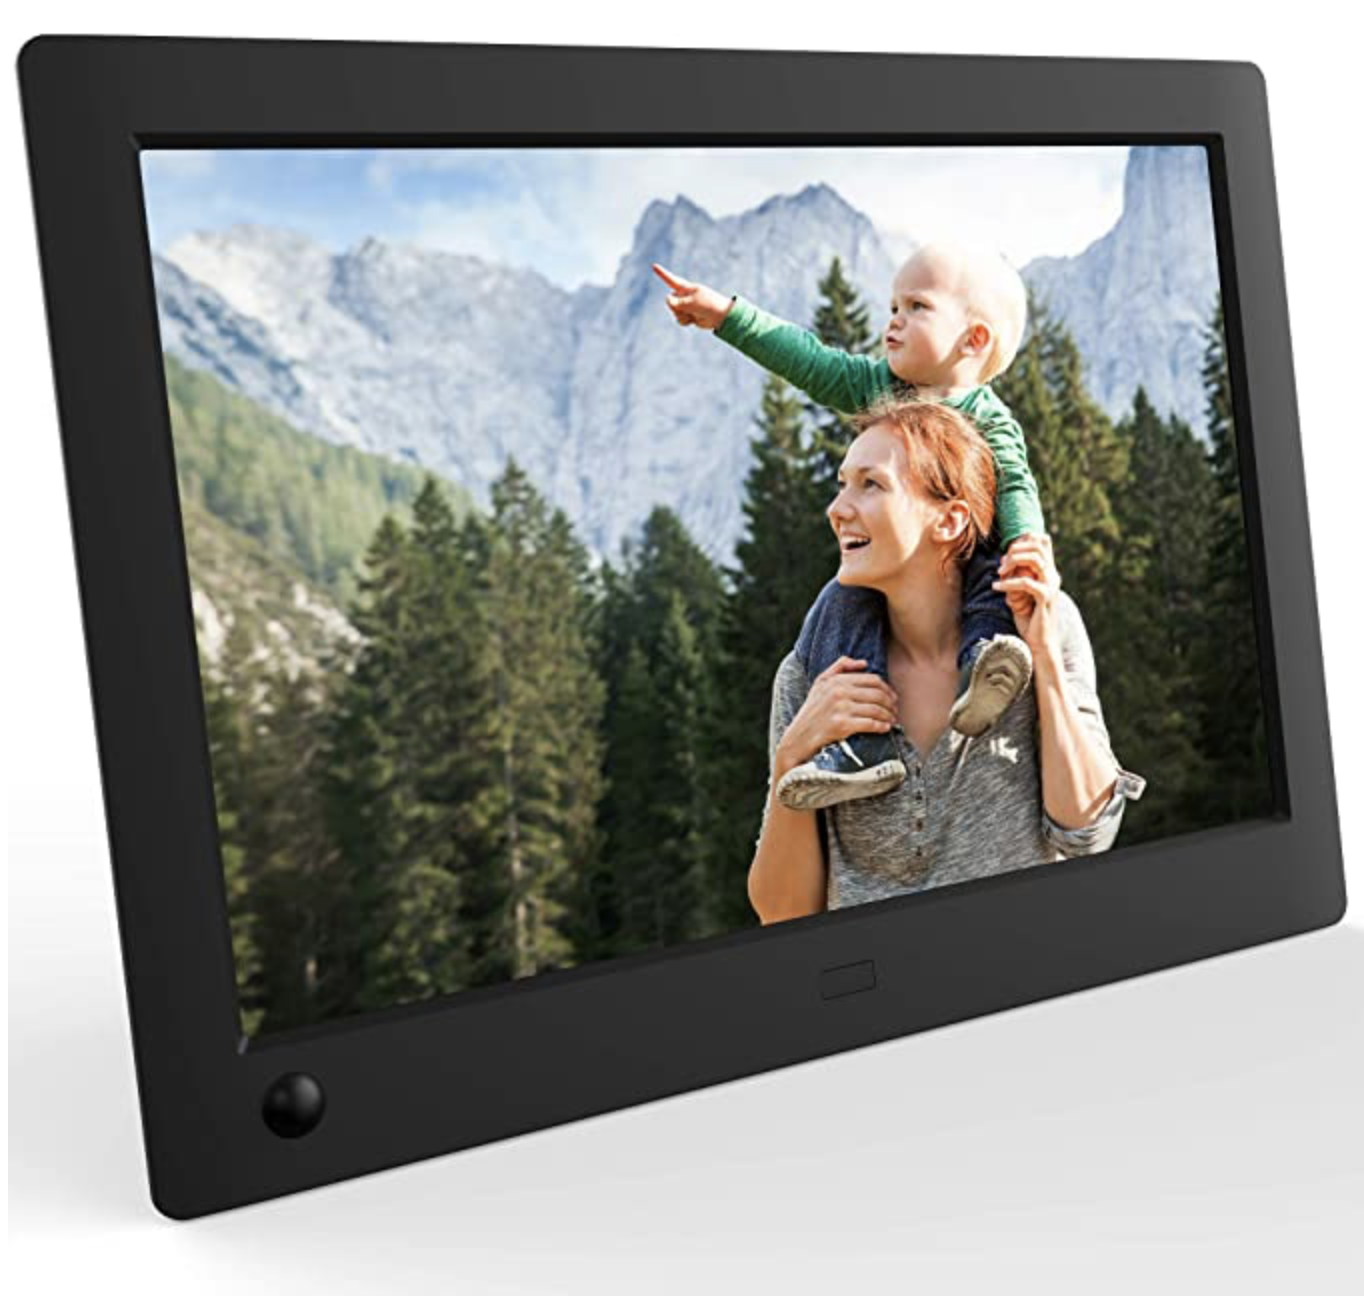 Nix Advance 8 Inch Usb Digital Photo Frame Hd Digital Photo Frame Photo Frame Mix Photo